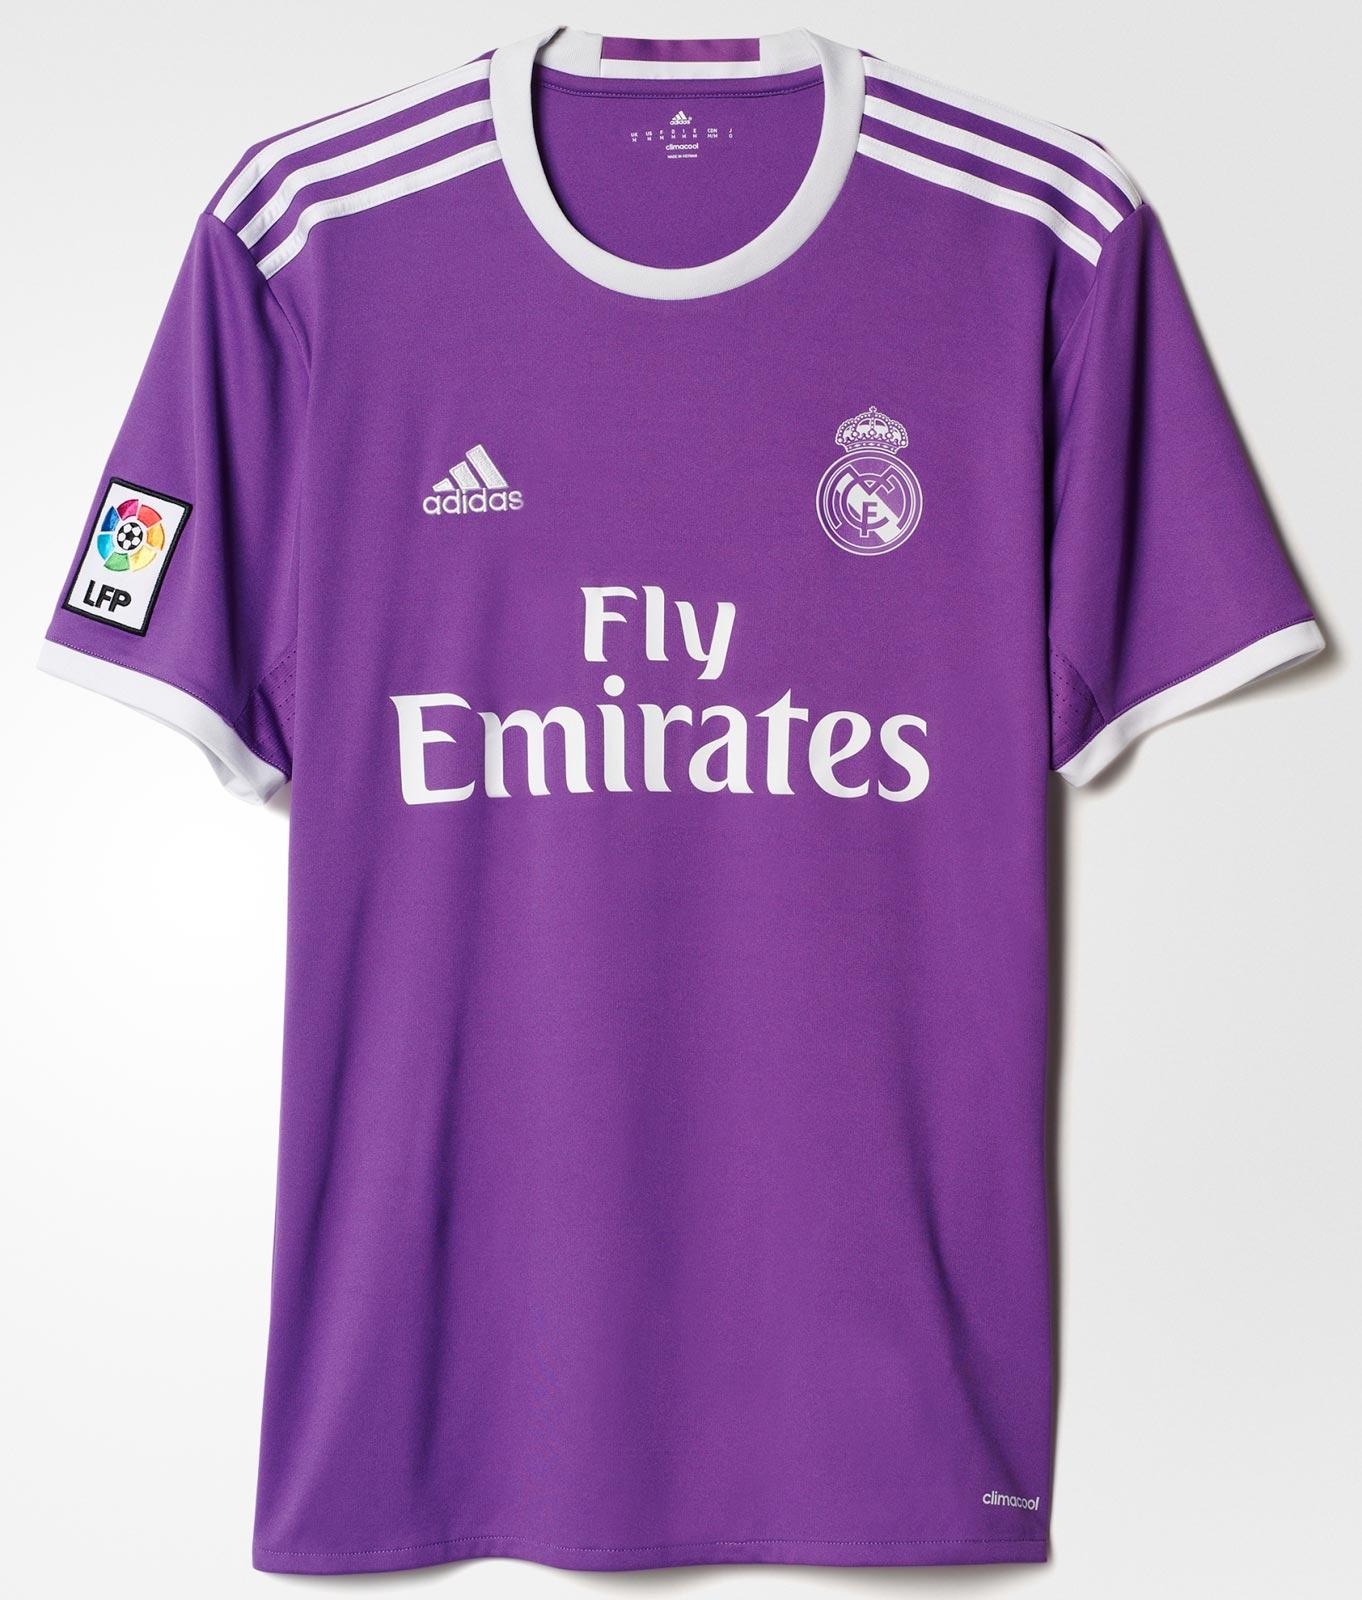 Favorite Adidas Real Madrid 2016 17 Kits 3rd Kit 1617